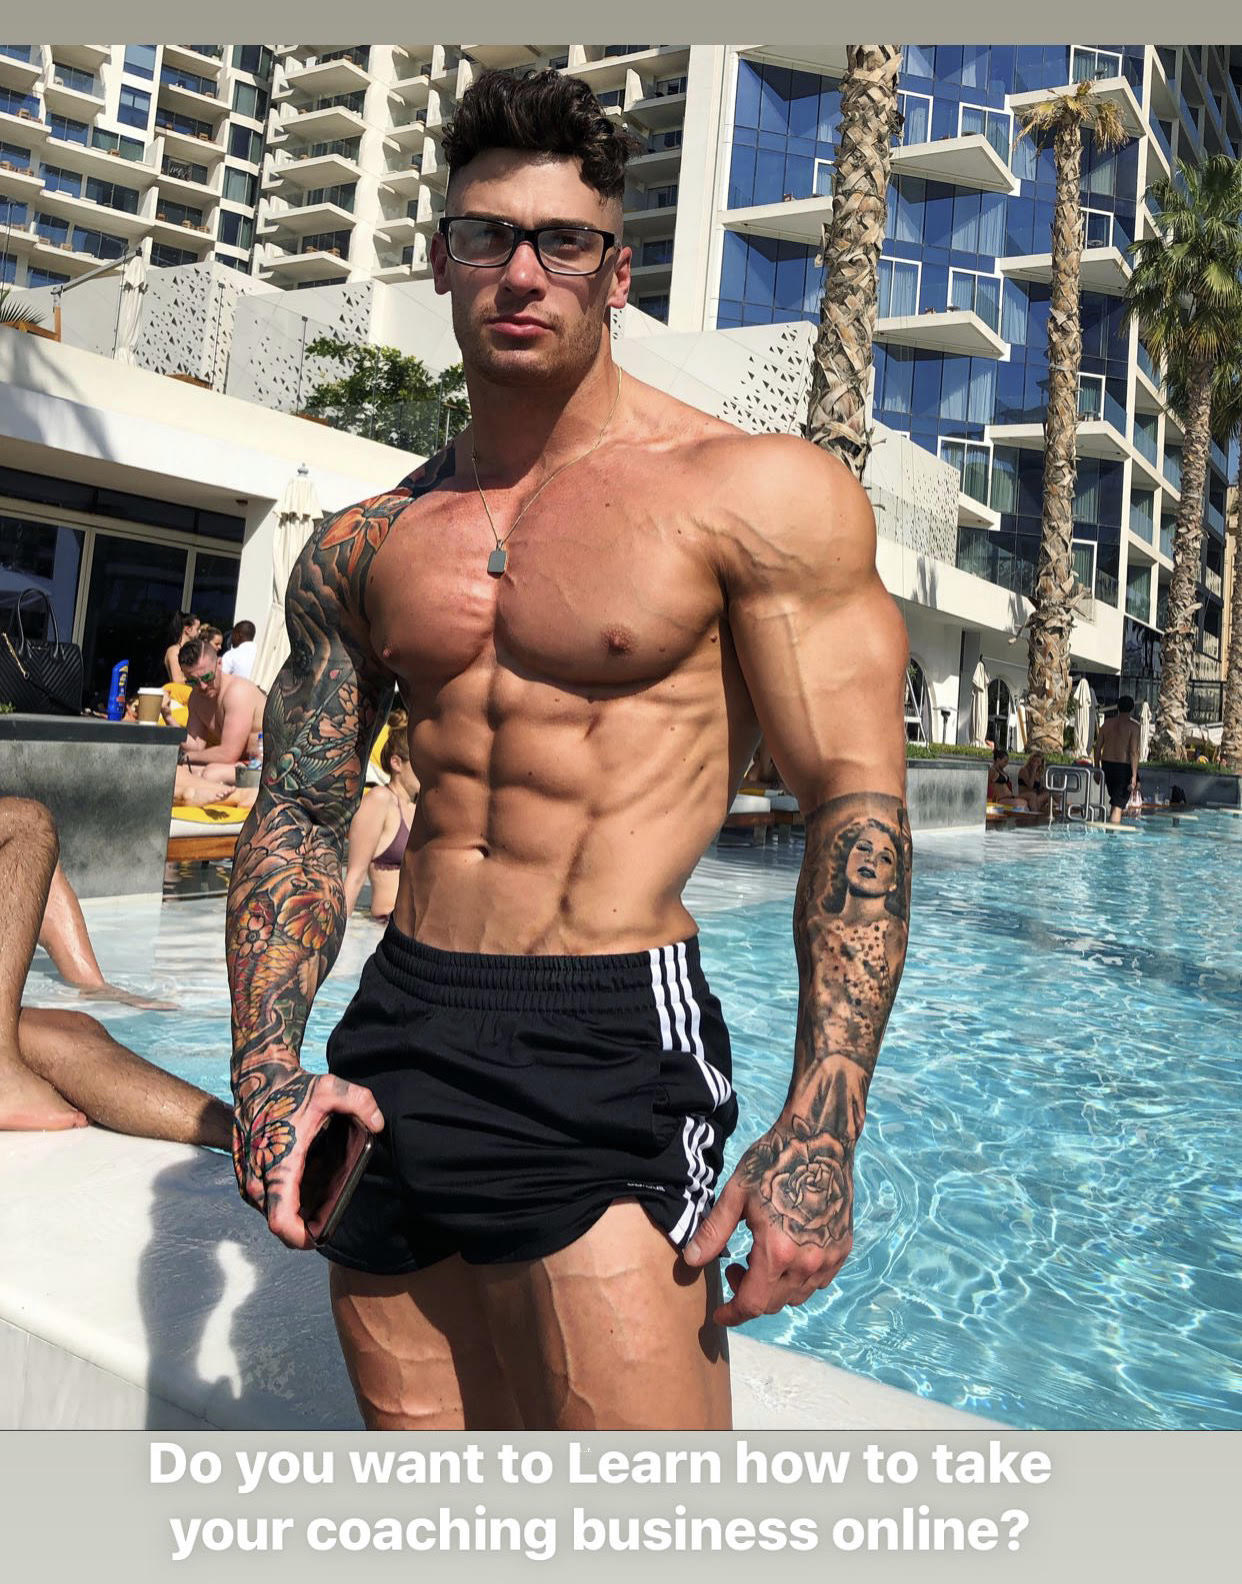 Lewis Harrison – a Fitness Model & Entrepreneur Generating $30K per Week Through Social Media – Shares His Secrets to Success